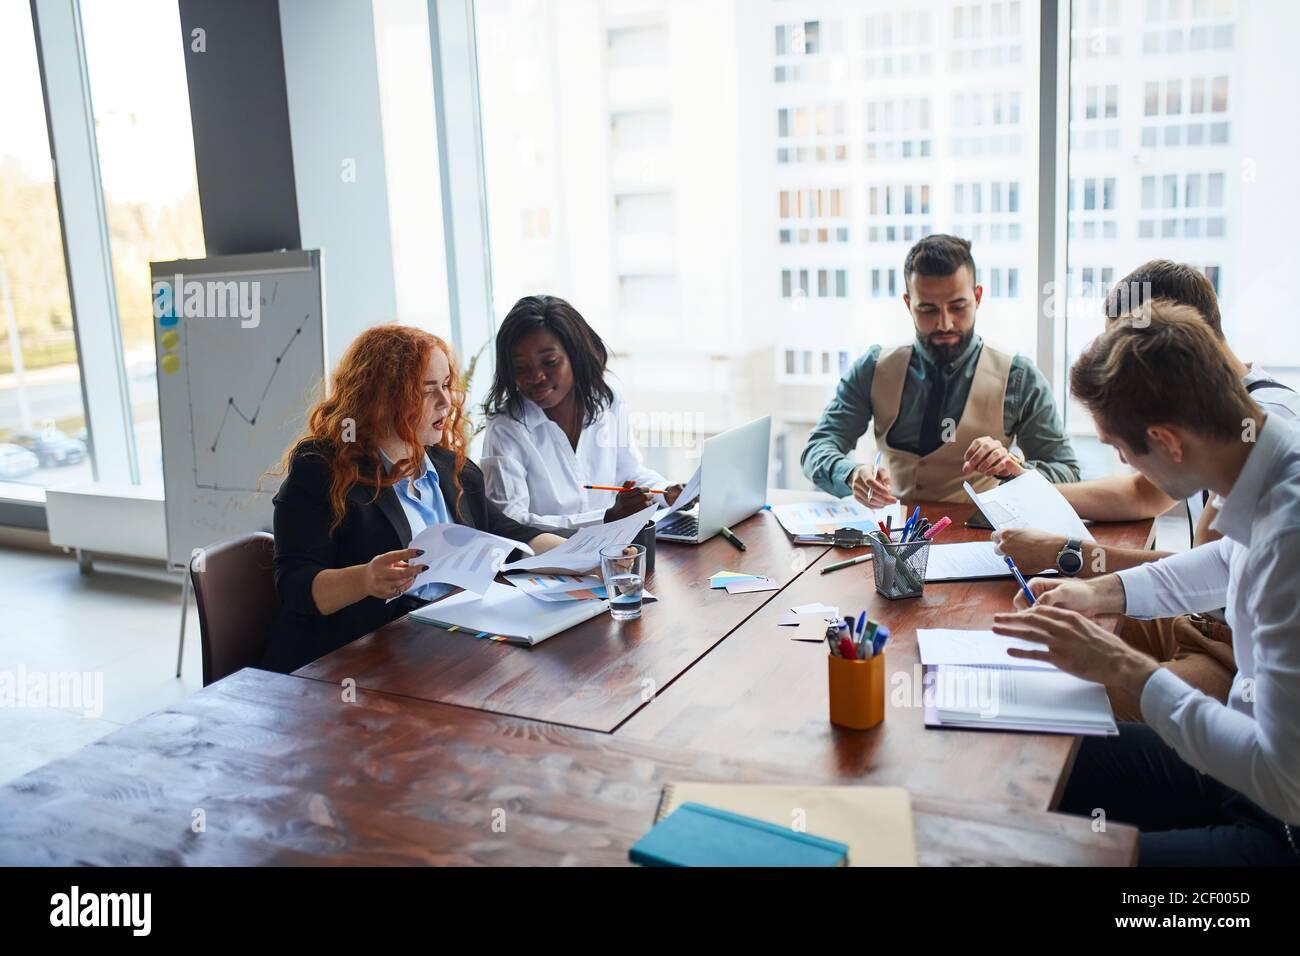 grupo internacional de personas, equipo de negocios se reunieron en la mesa para discutir ideas de negocios, usando papeles, diagramas. Gente de negocios creativa Foto de stock